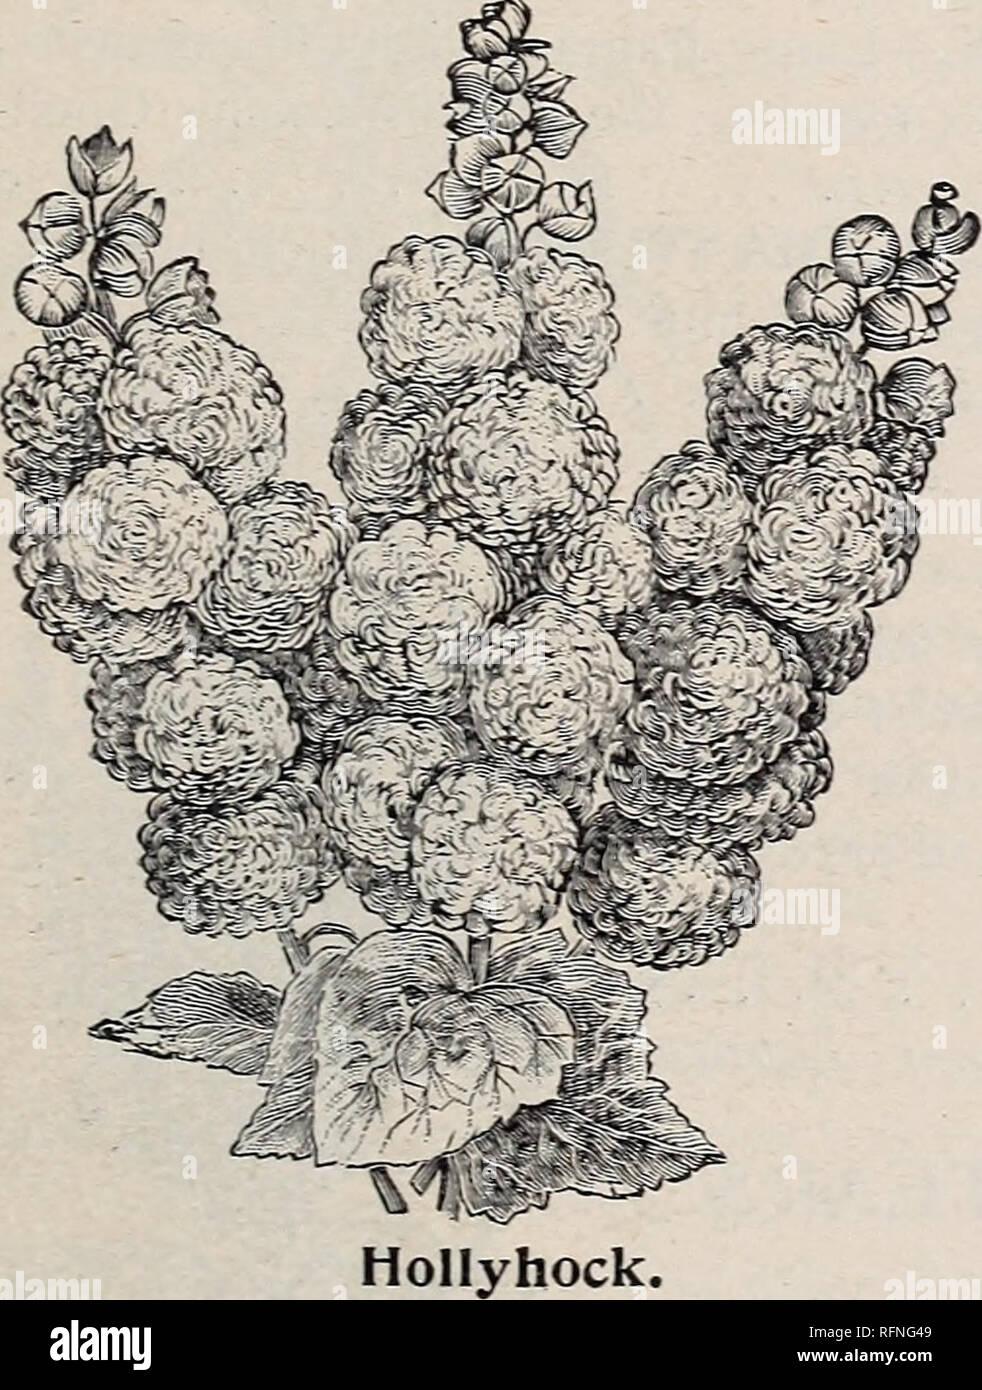 10 Magnolia Flower Seeds Mixed Fragrant Tree Japan Perennial Ornamental Plant